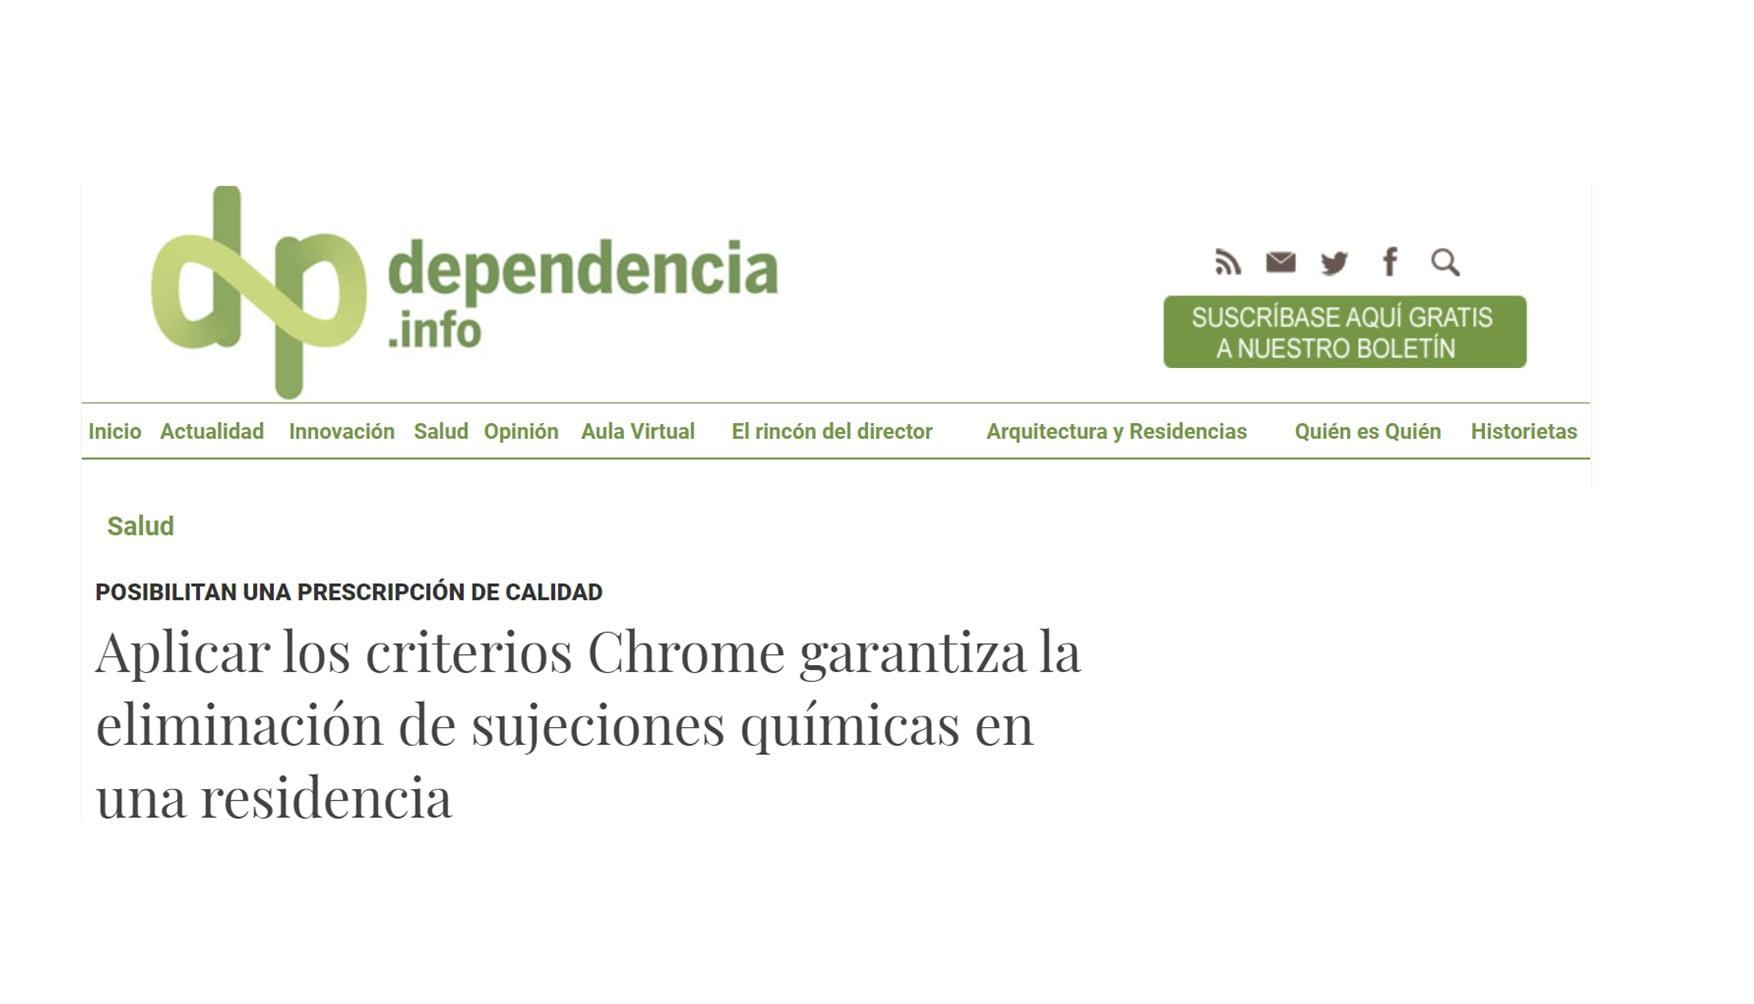 Artículo de Dependencia.info y entrevista a Ruben Muñiz sobre Criterios CHROME®